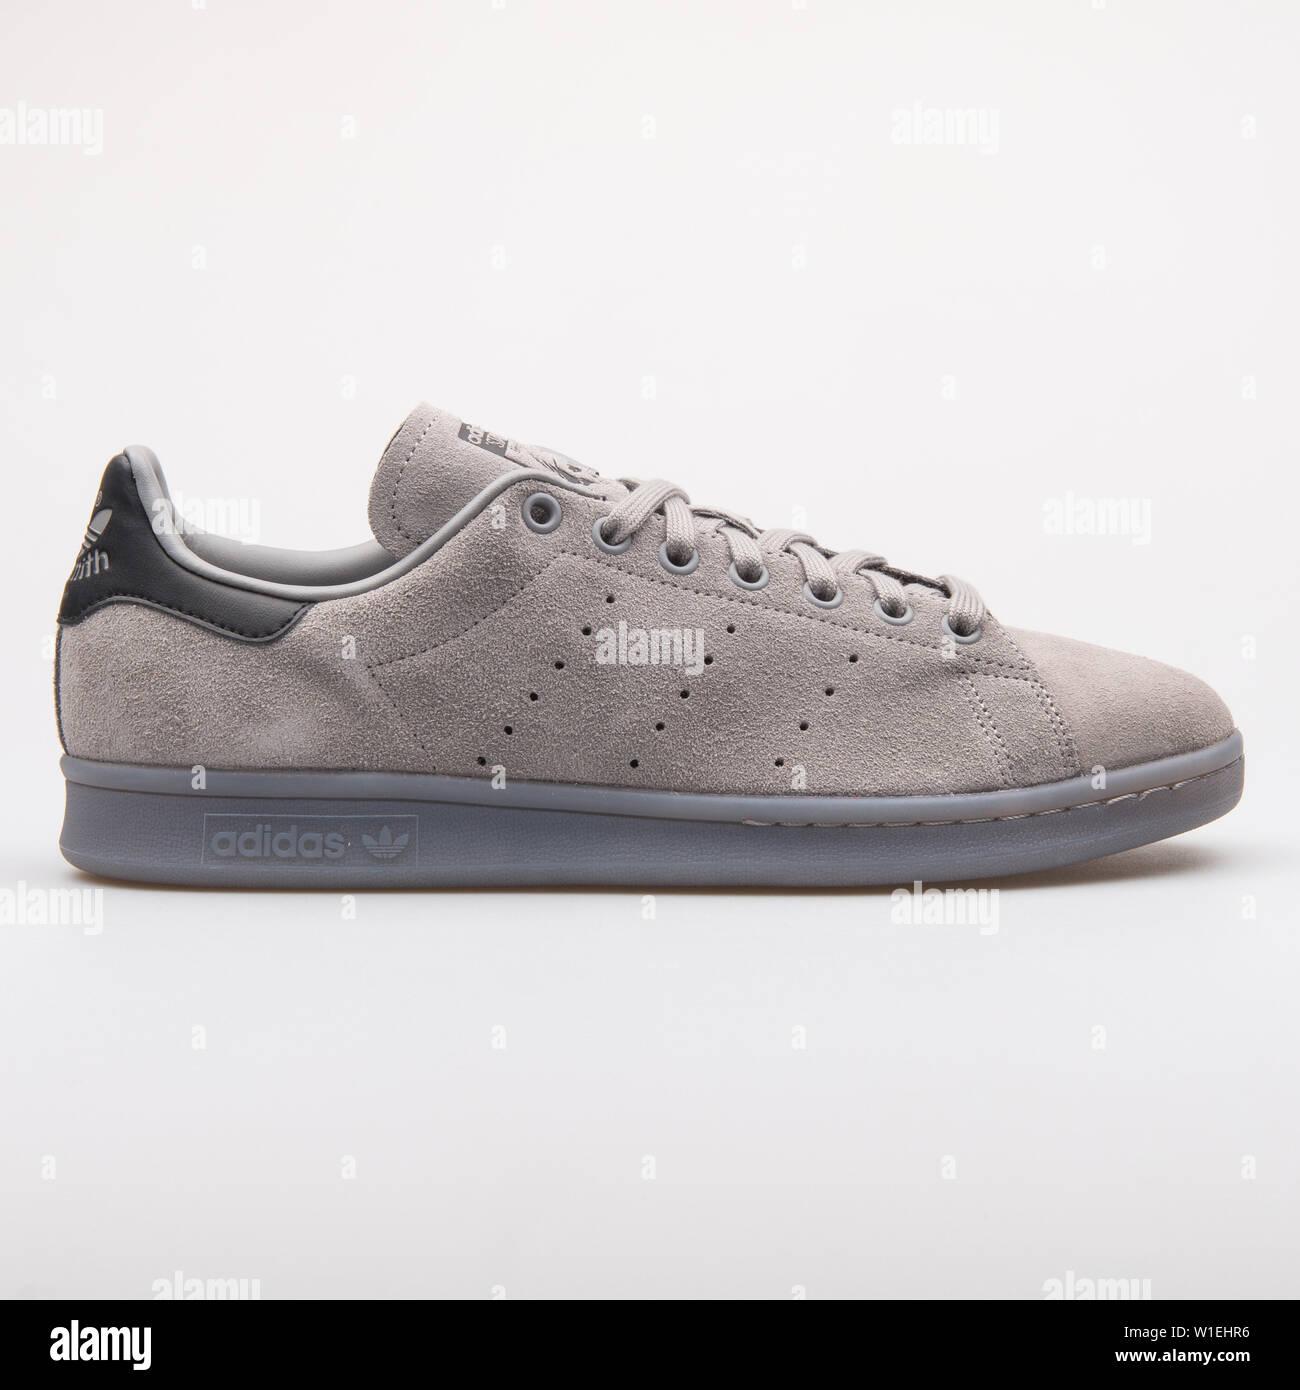 Muestra Acera hipótesis  VIENNA, AUSTRIA - AUGUST 23, 2017: Adidas Stan Smith grey sneaker on white  background Stock Photo - Alamy